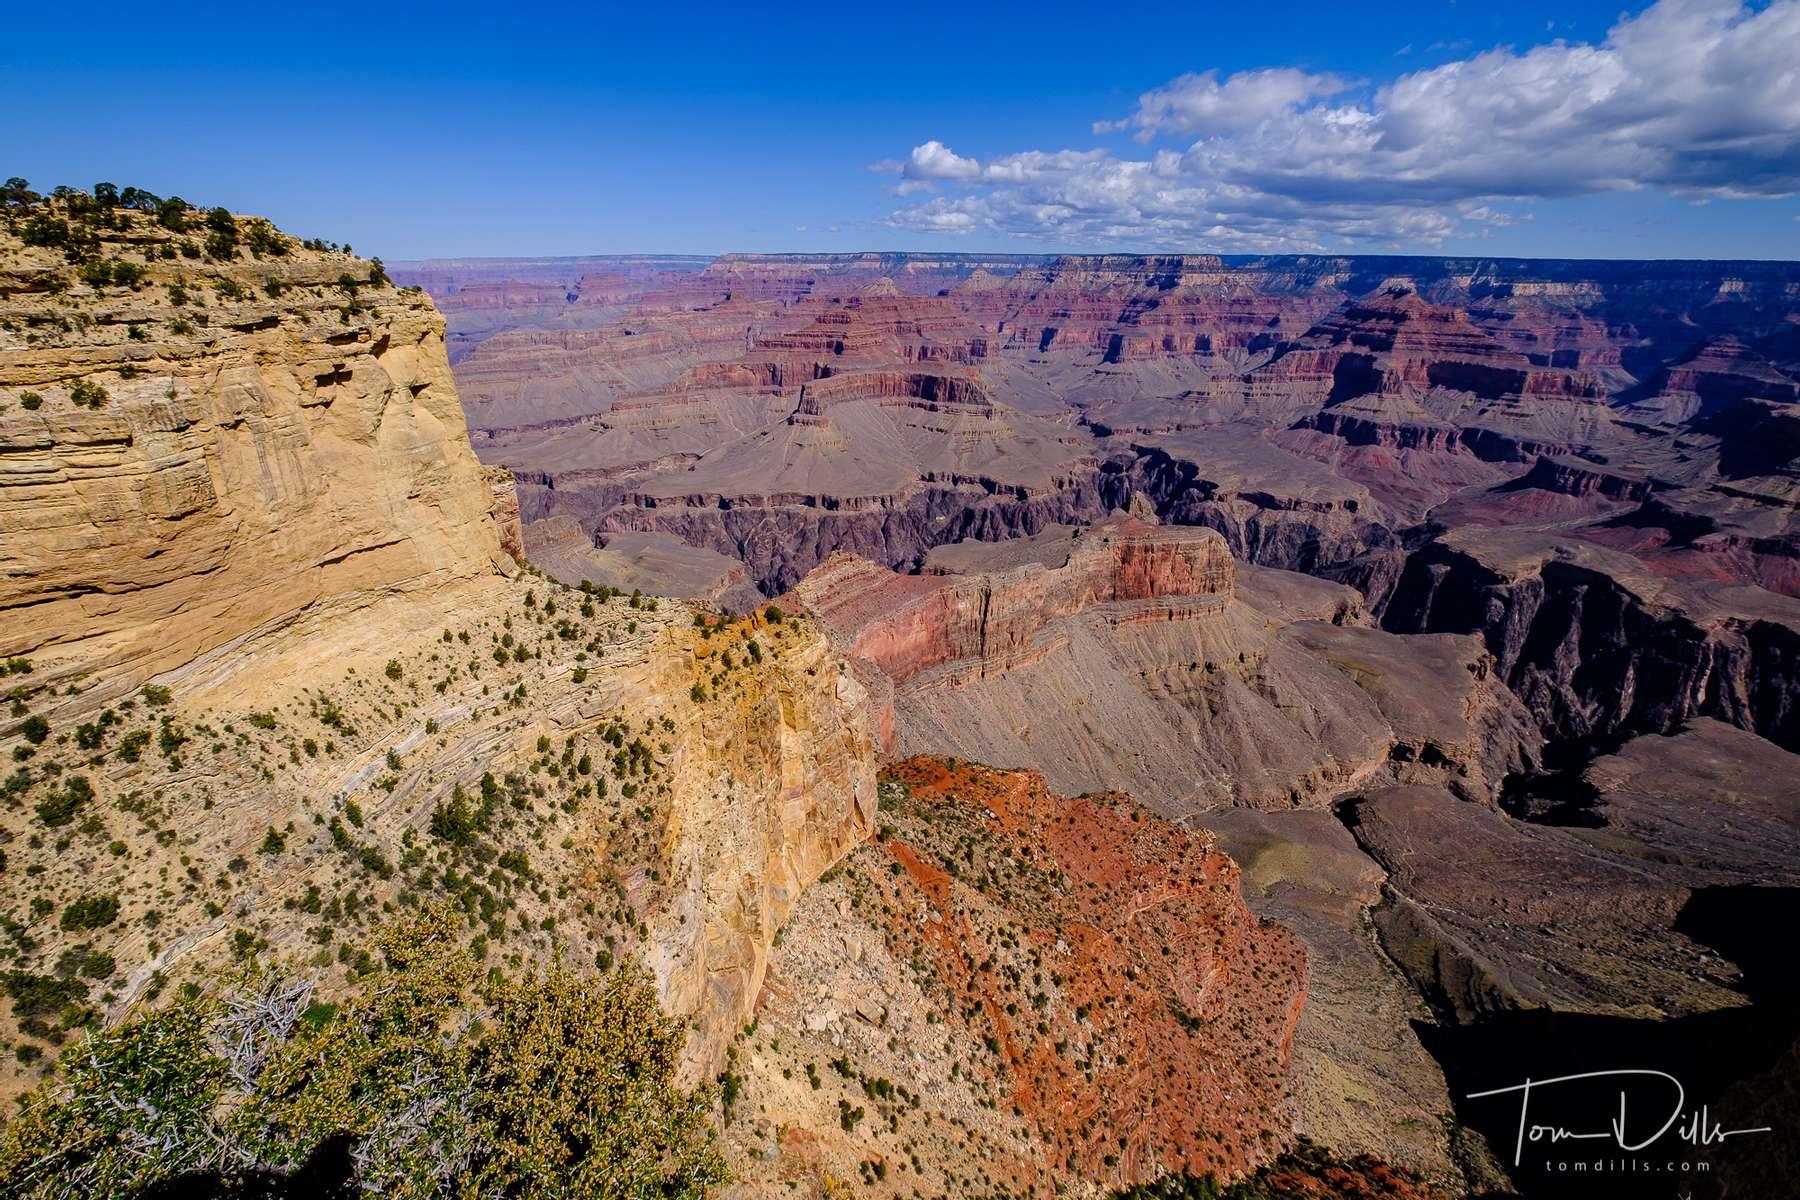 Views from Maricopa Point Overlook, Grand Canyon National Park, Arizona